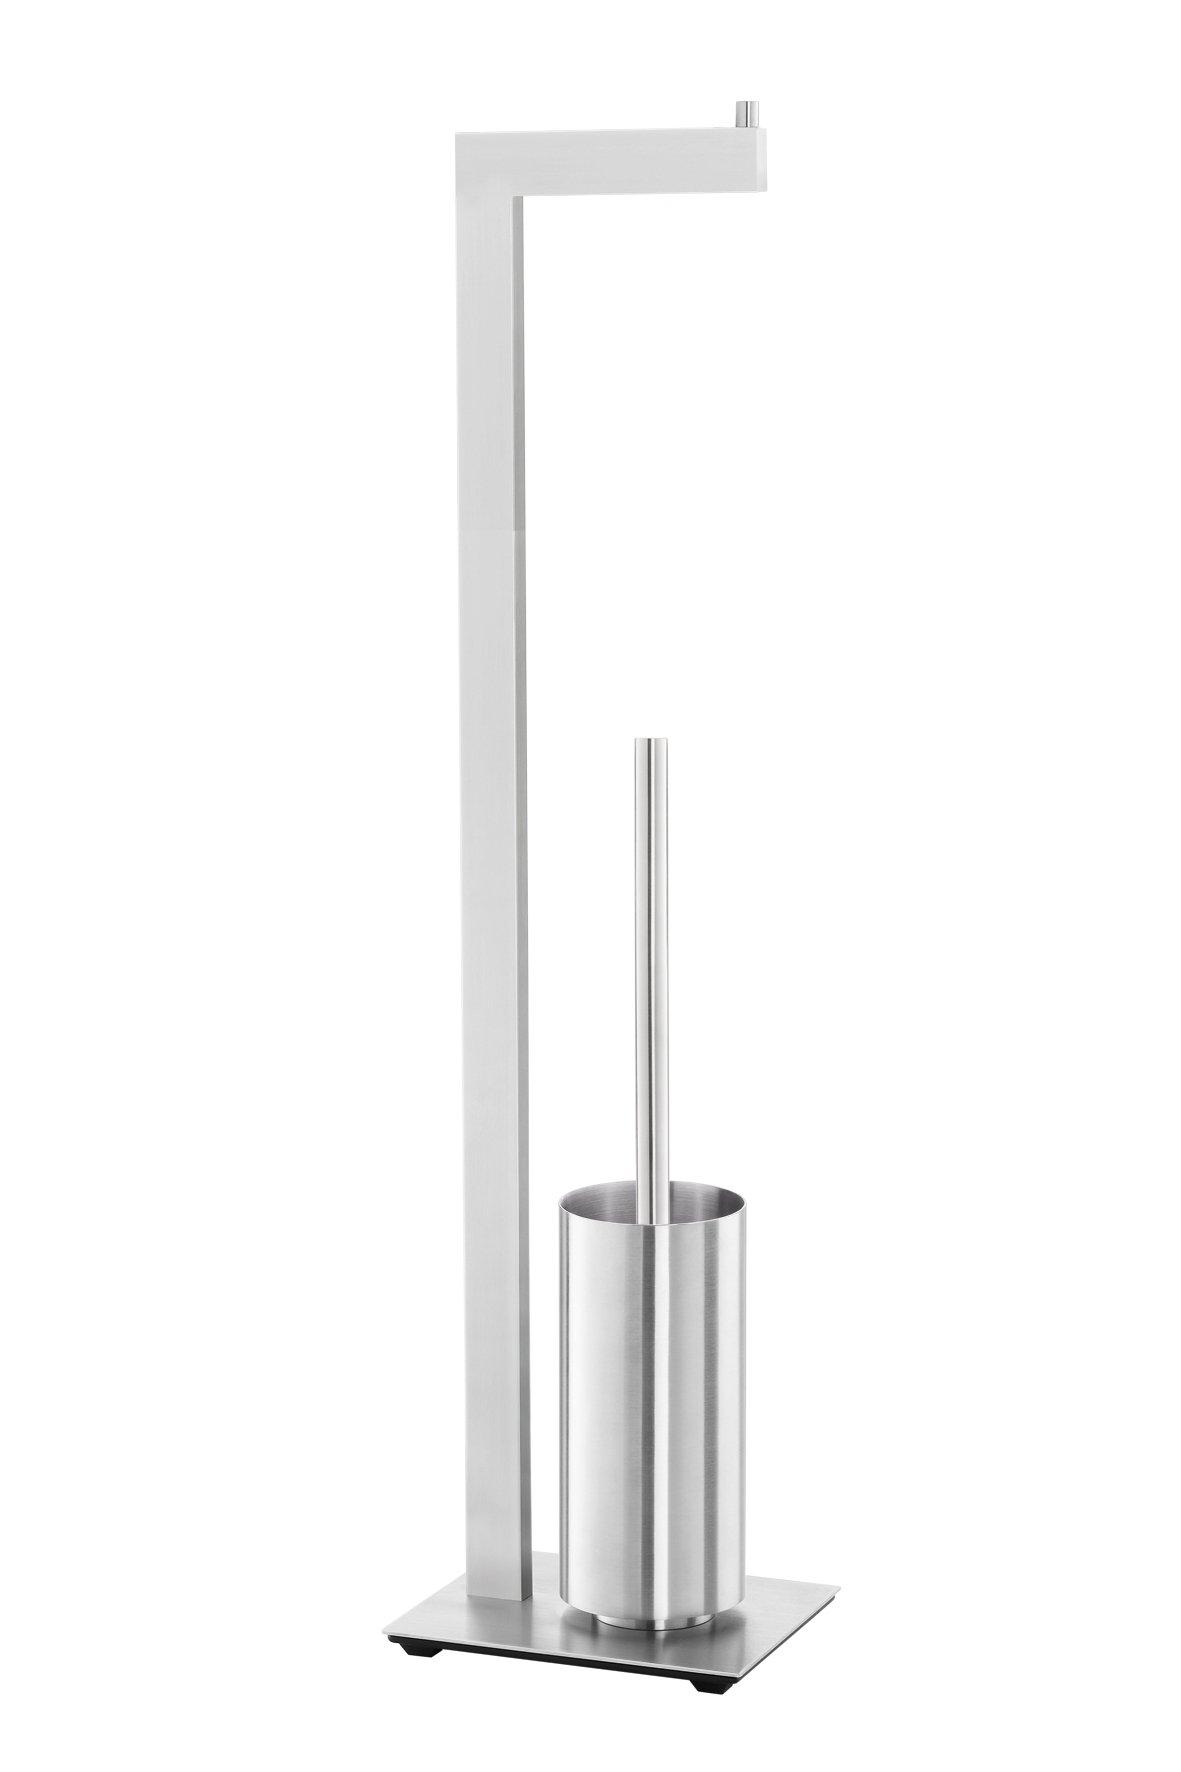 ZACK 40382 Linea Toilet Butler with Grey Toilet Brush